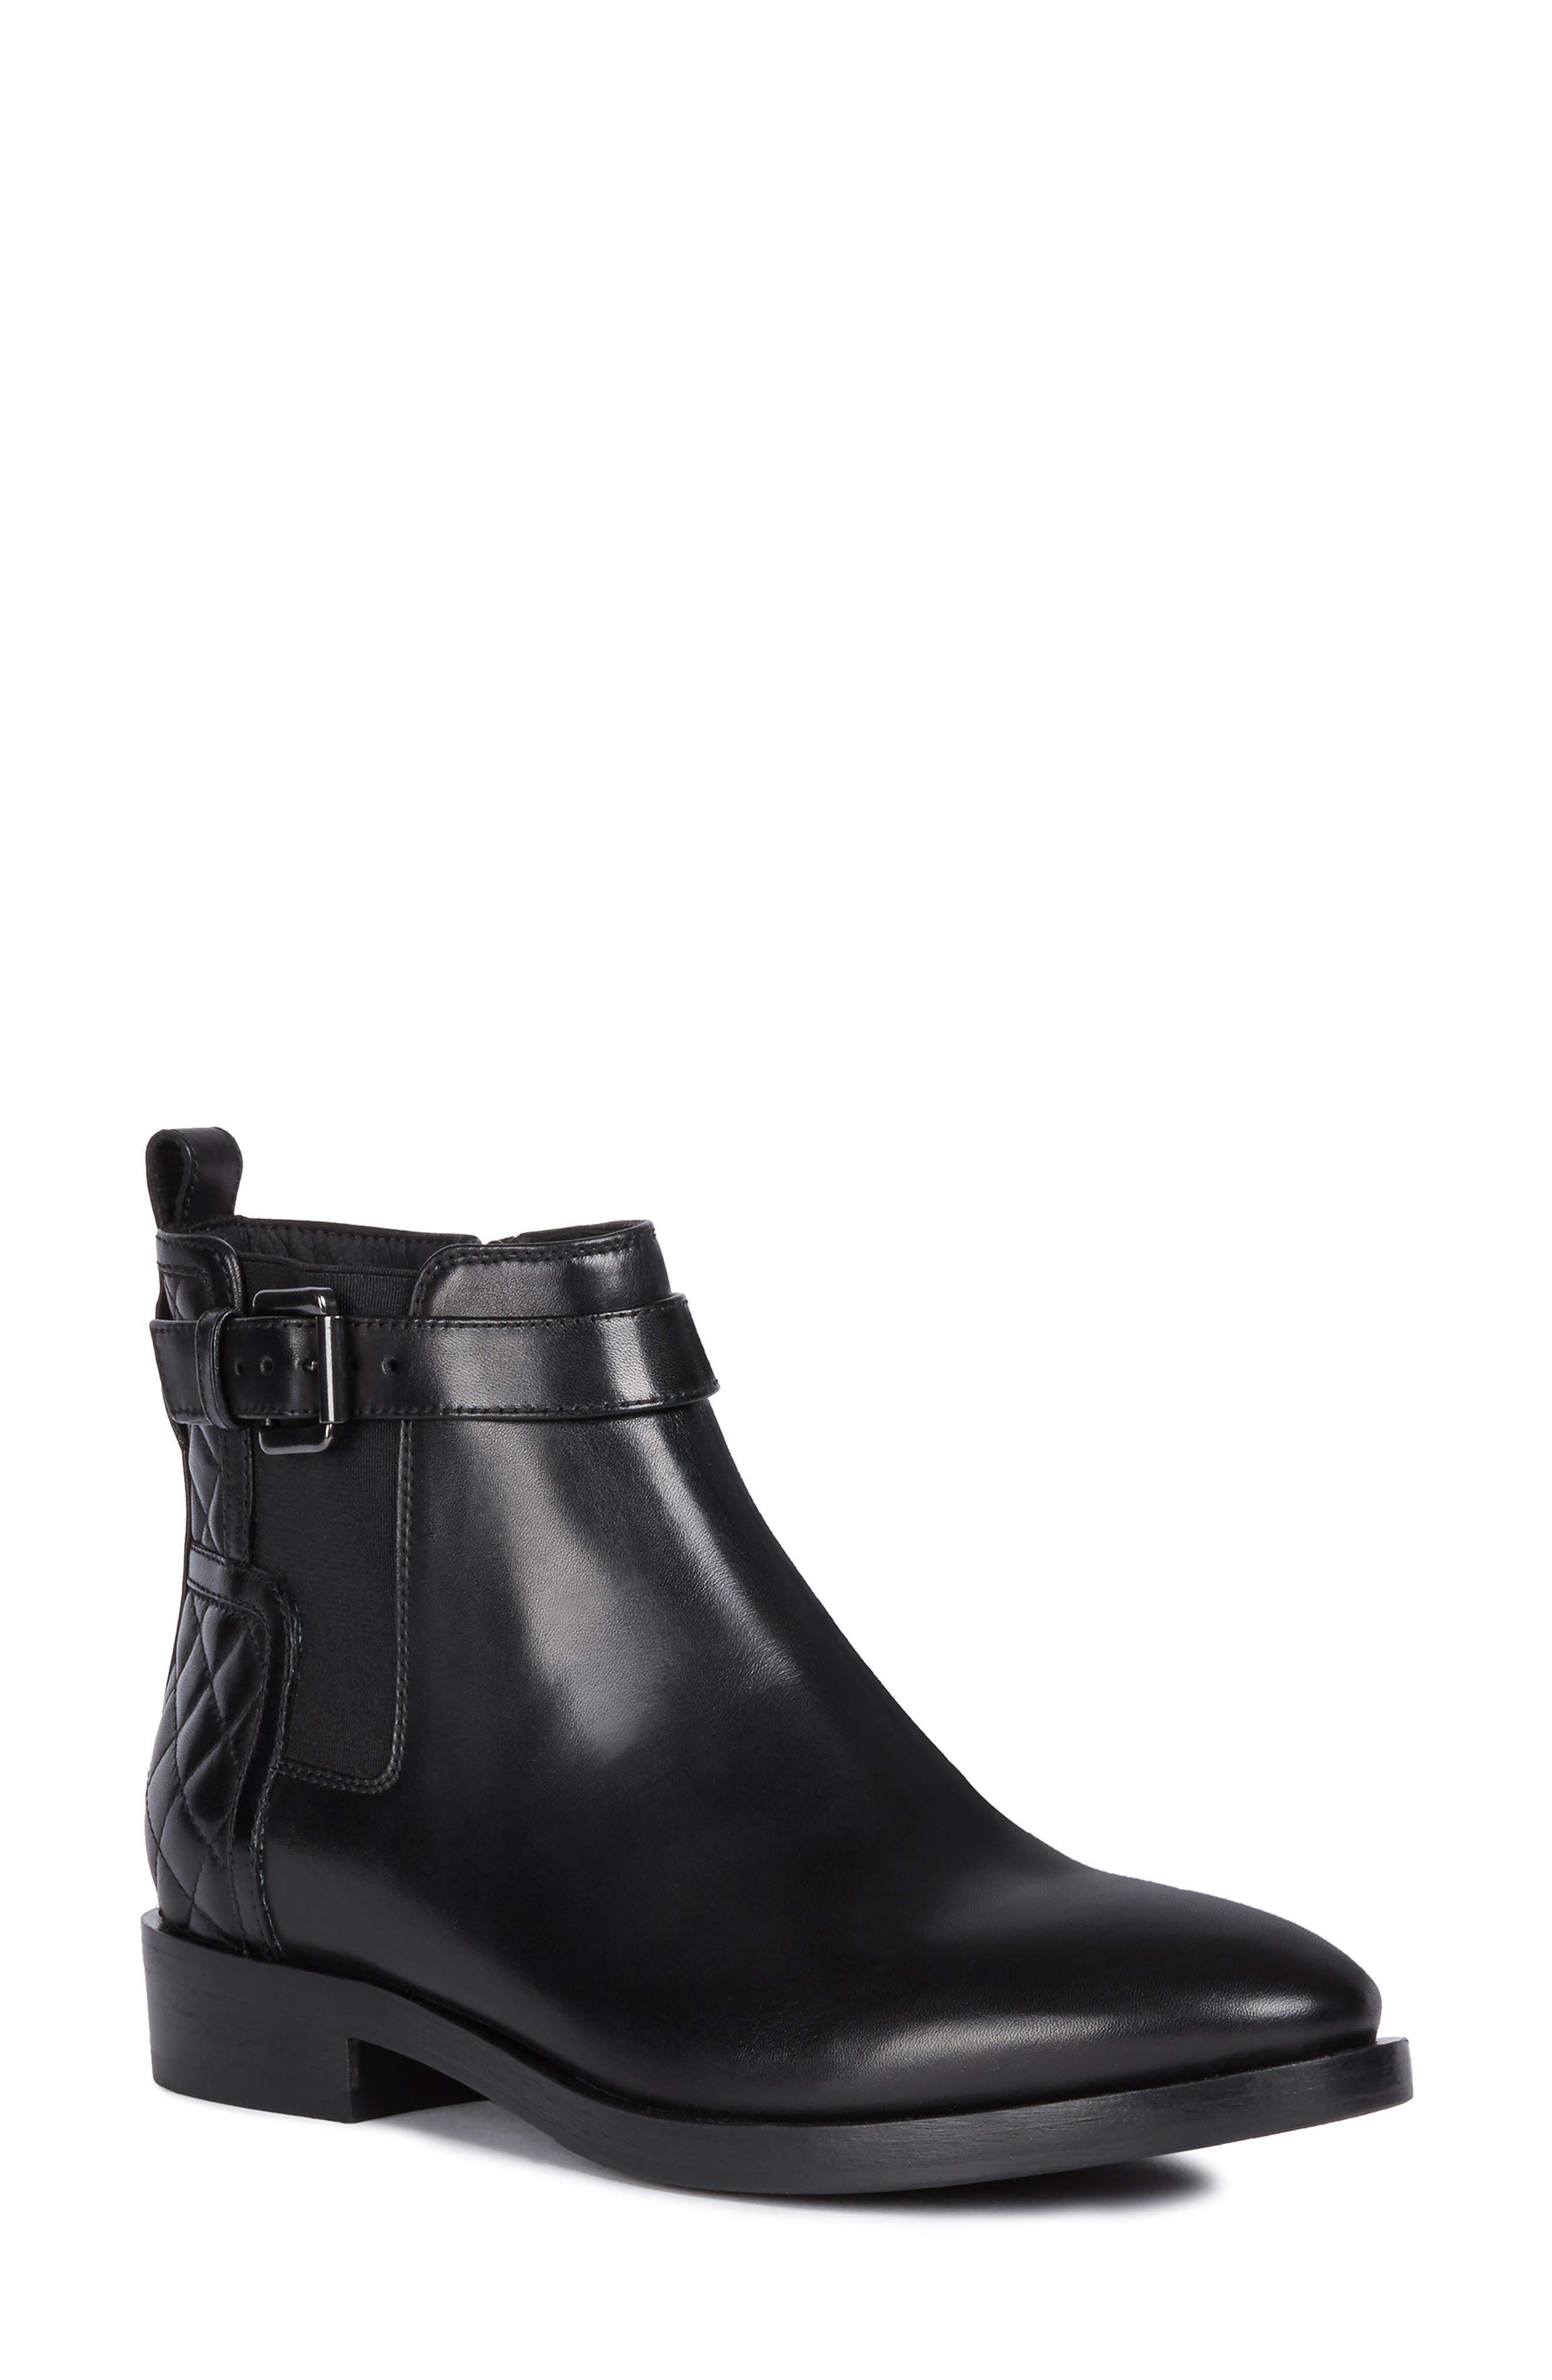 Geox Marlyna C Women's Smart Formal Shoes In Black Lyst